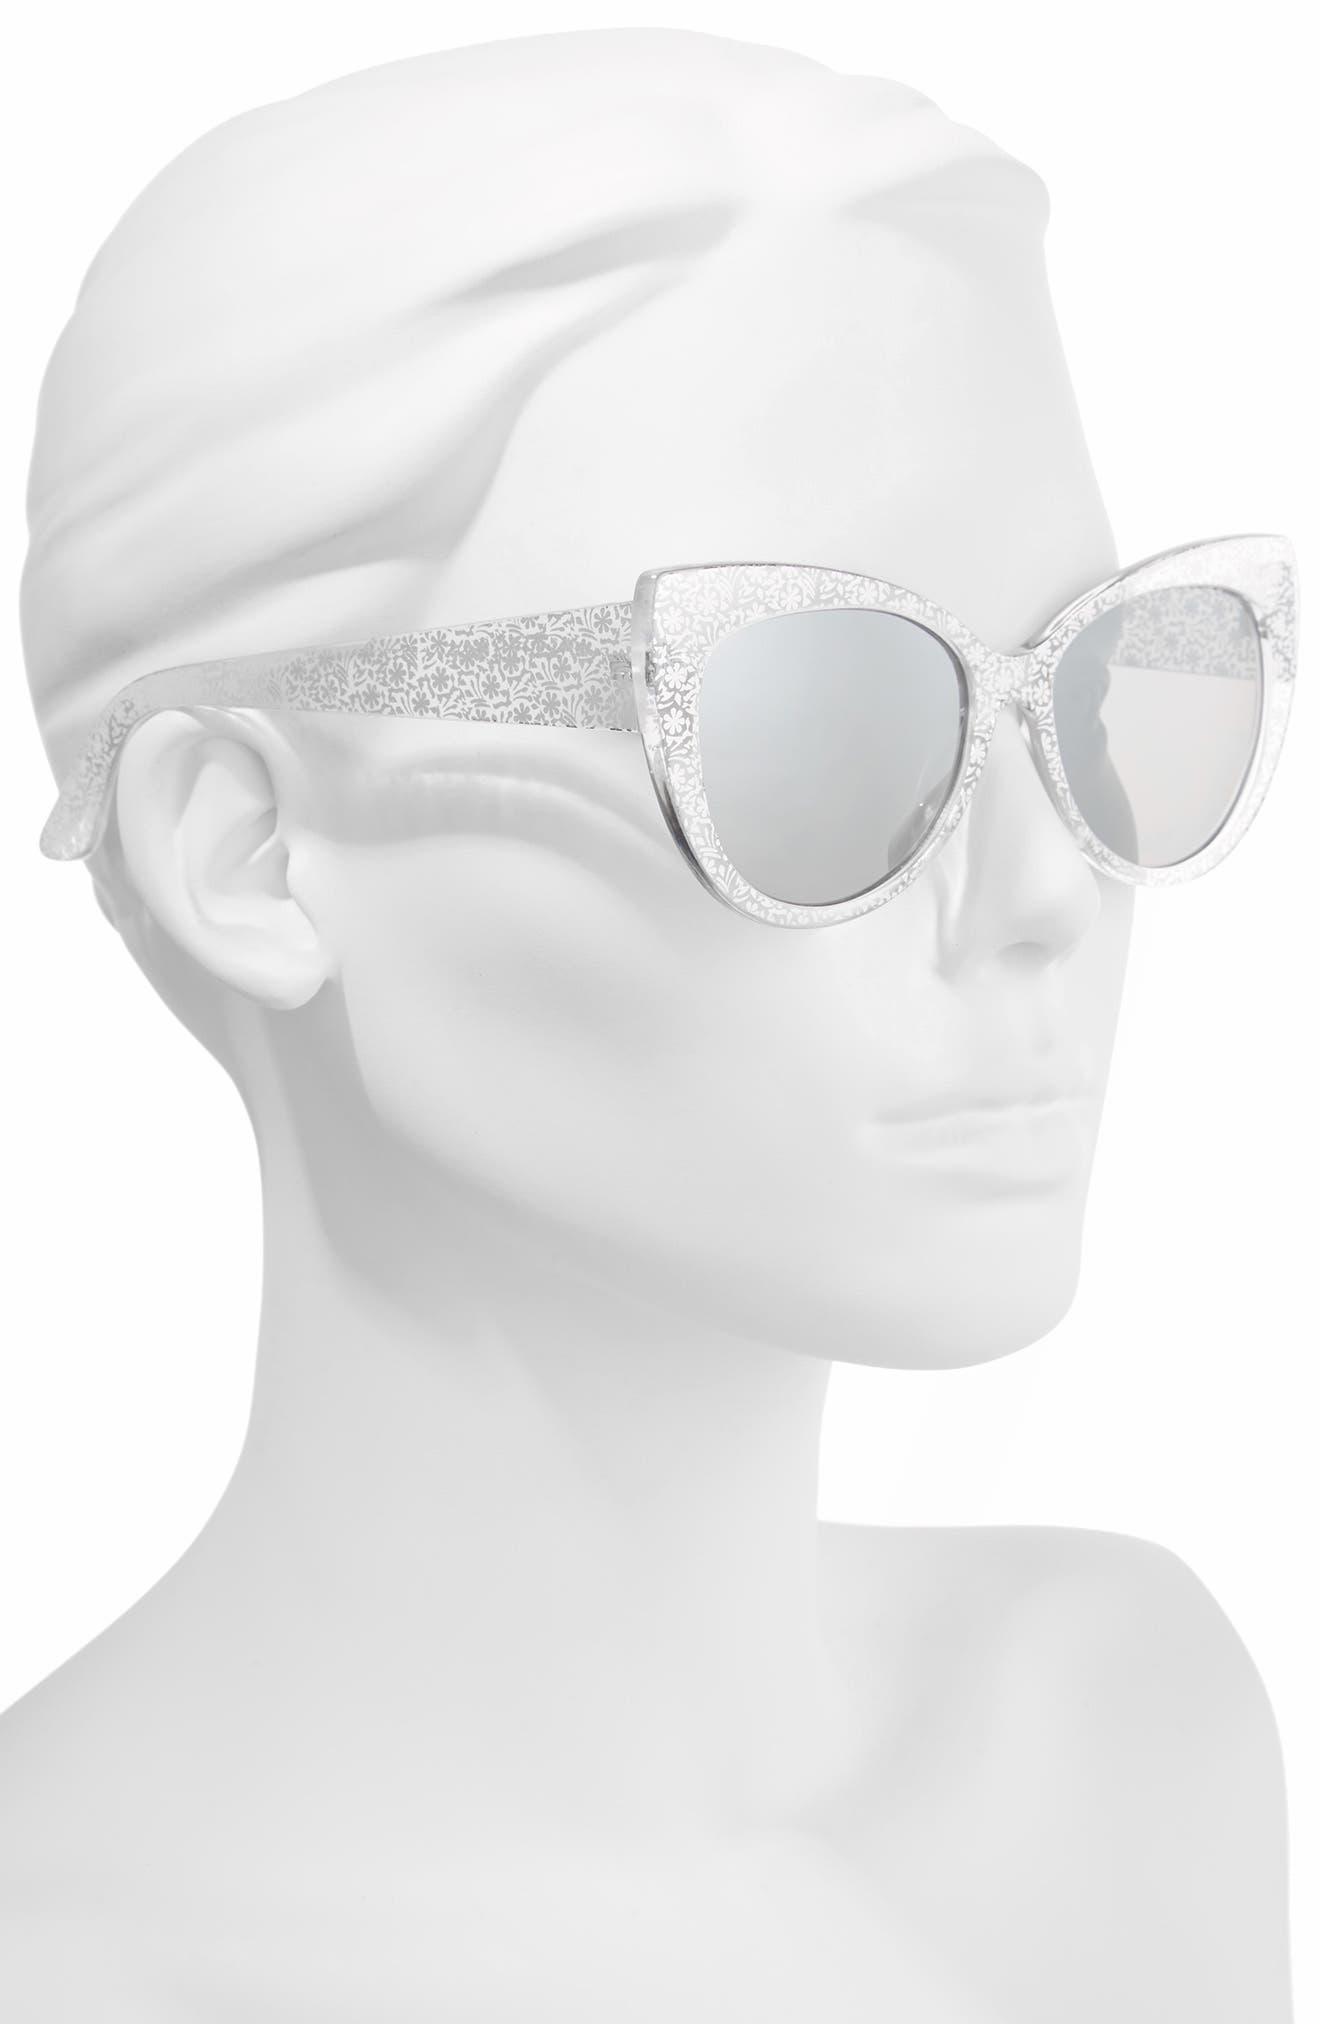 55mm Floral Cat Eye Sunglasses,                             Alternate thumbnail 2, color,                             040